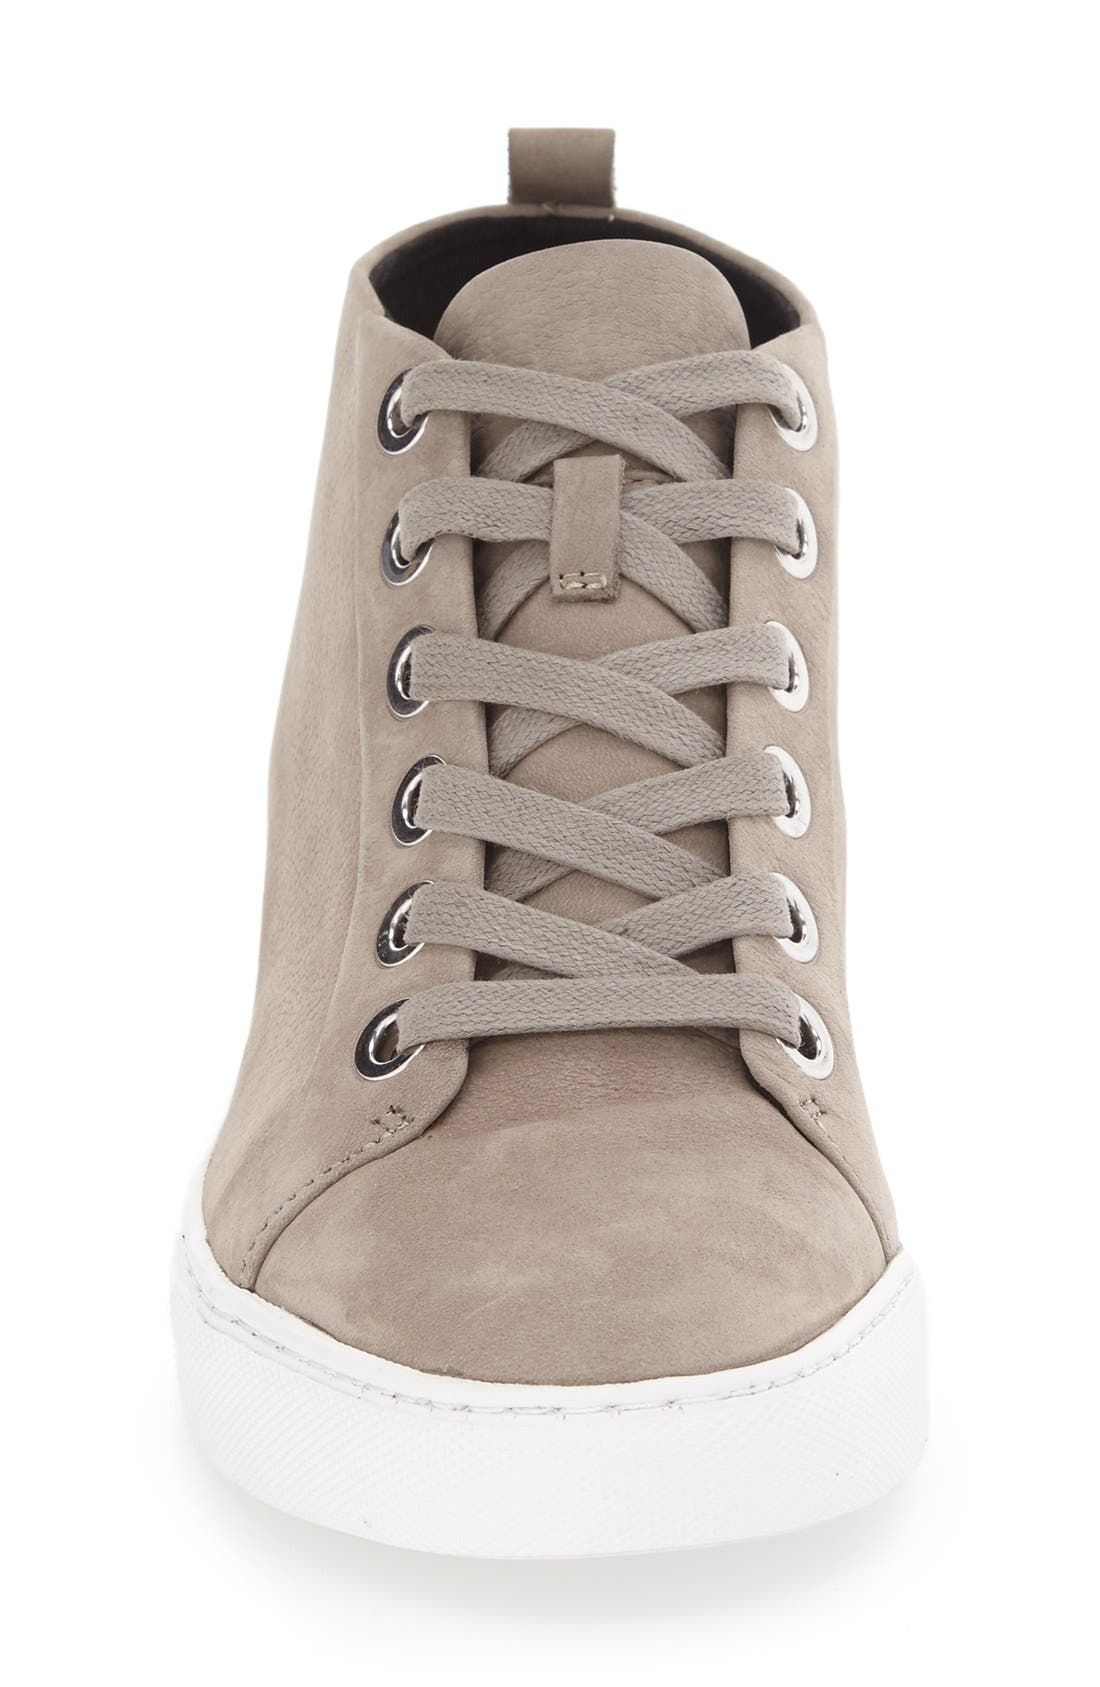 'Kaleb' High Top Sneaker,                             Alternate thumbnail 3, color,                             Cloud Nubuck Leather